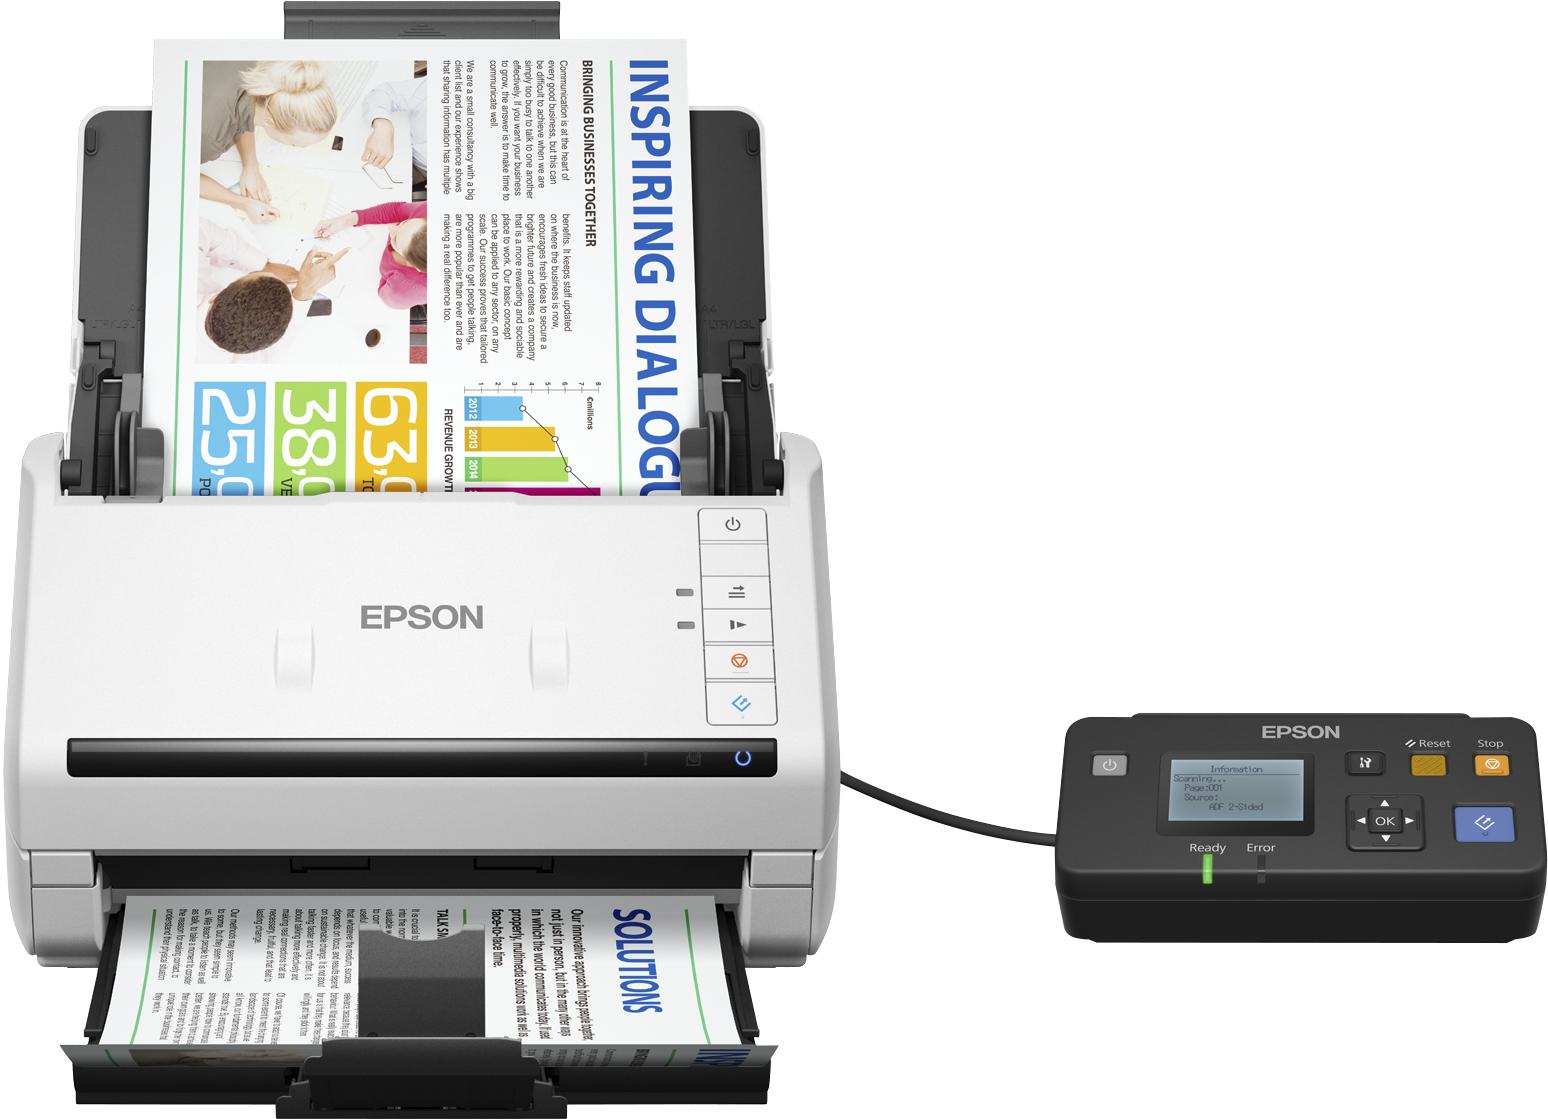 Epson WorkForce DS-530N